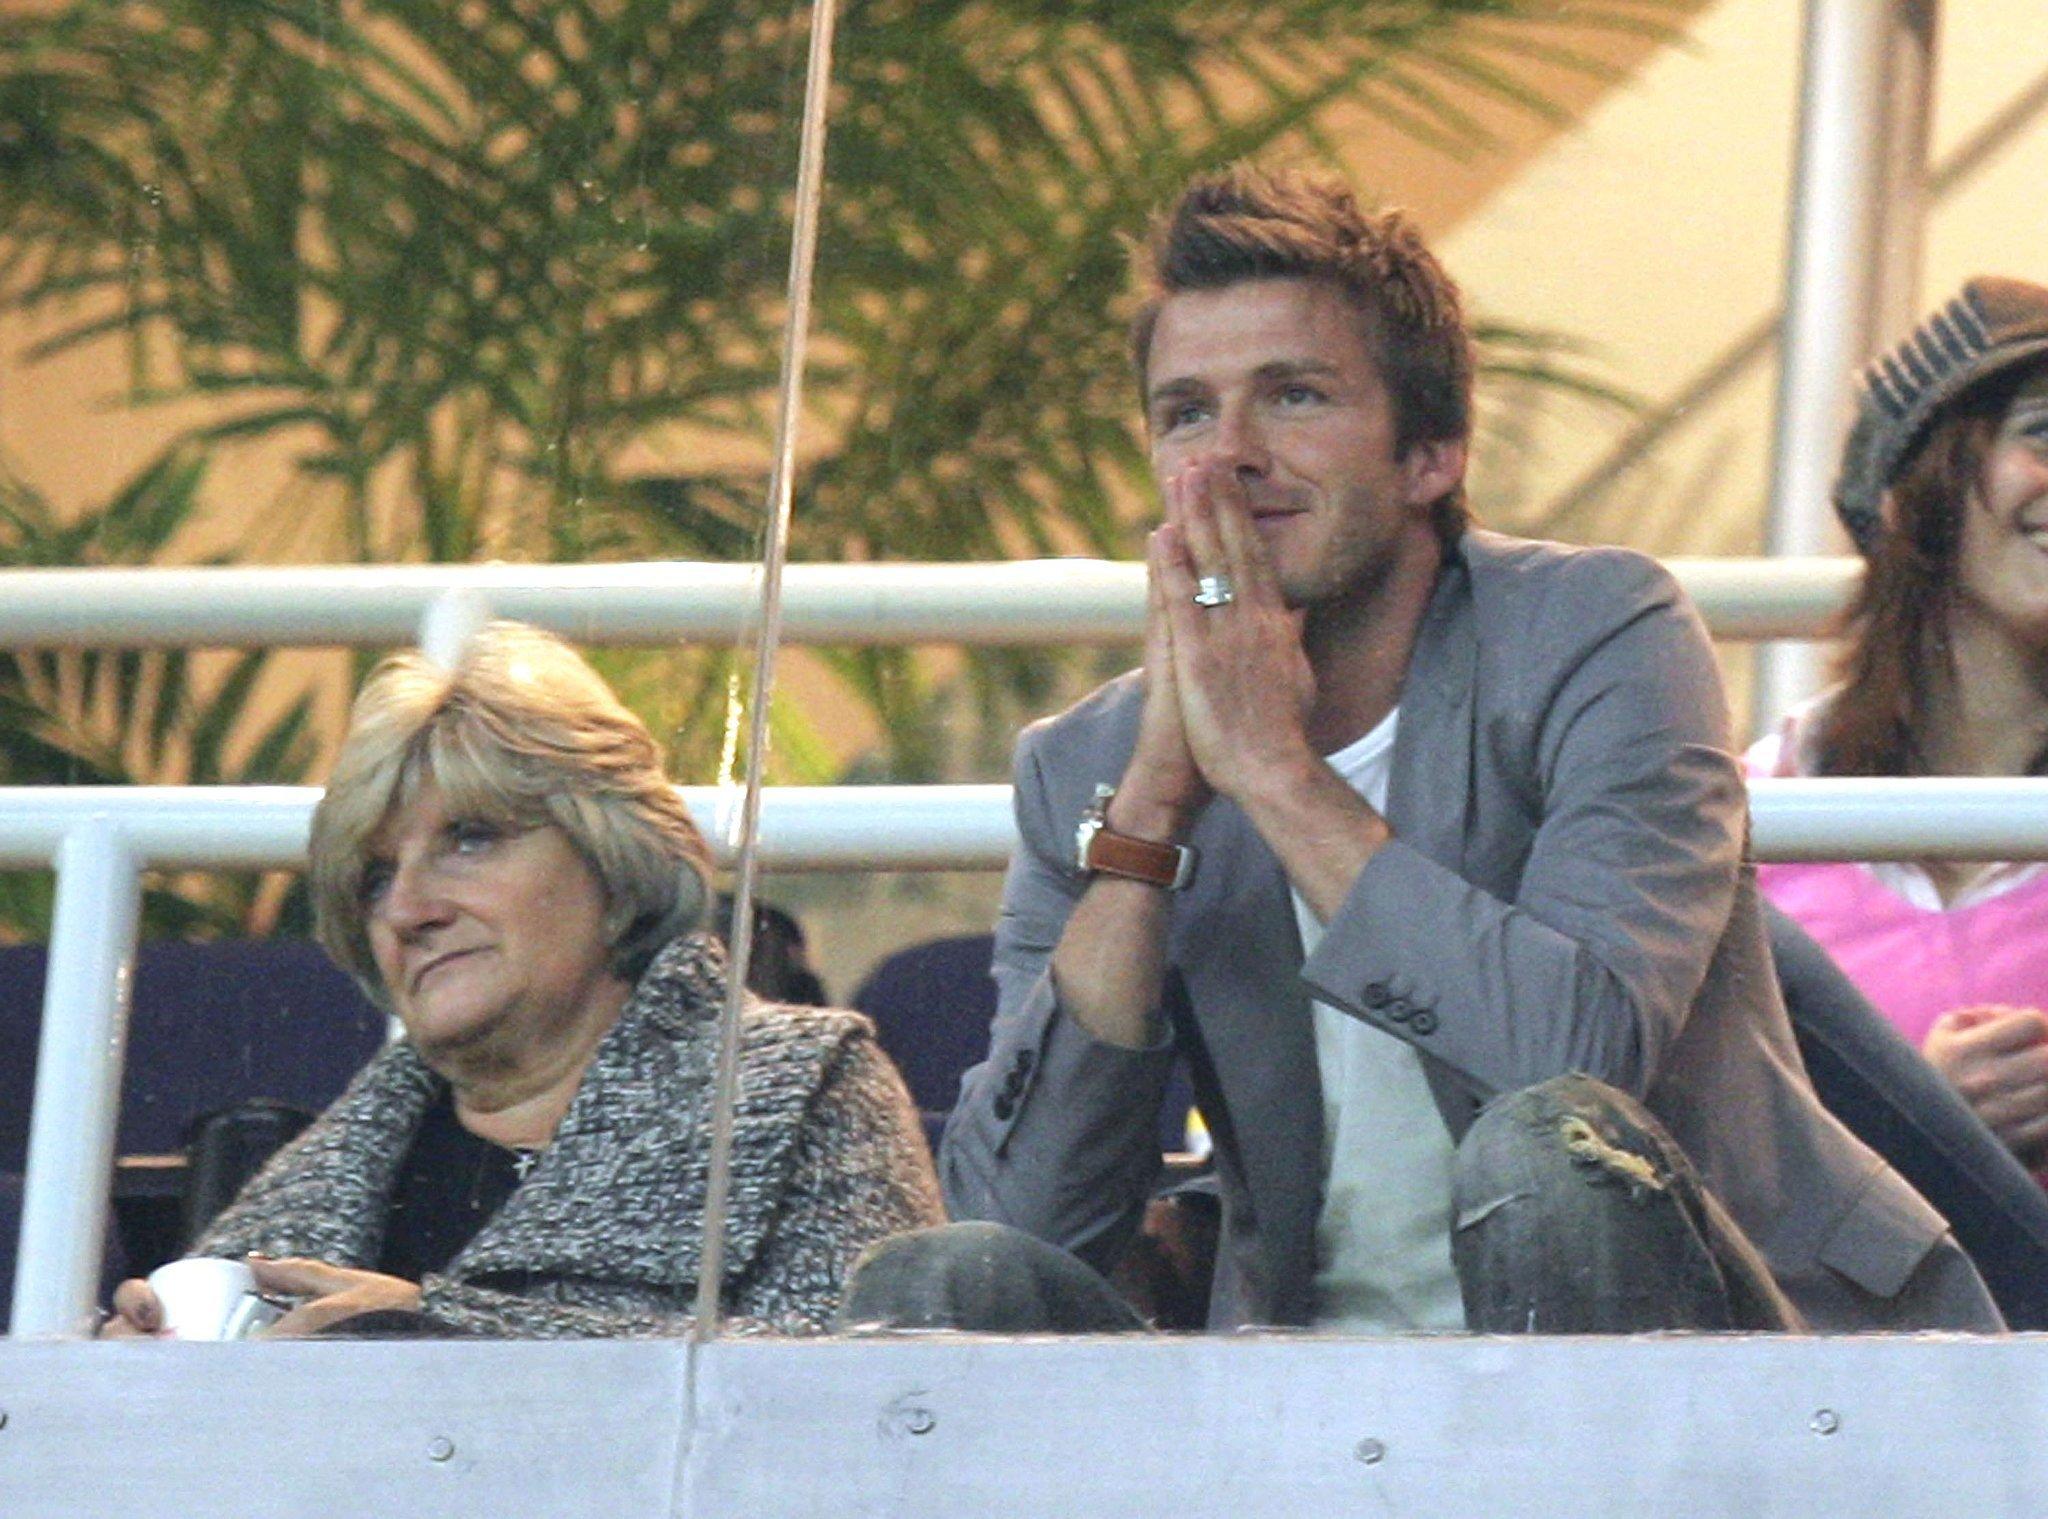 David Beckham and Sandra Beckham